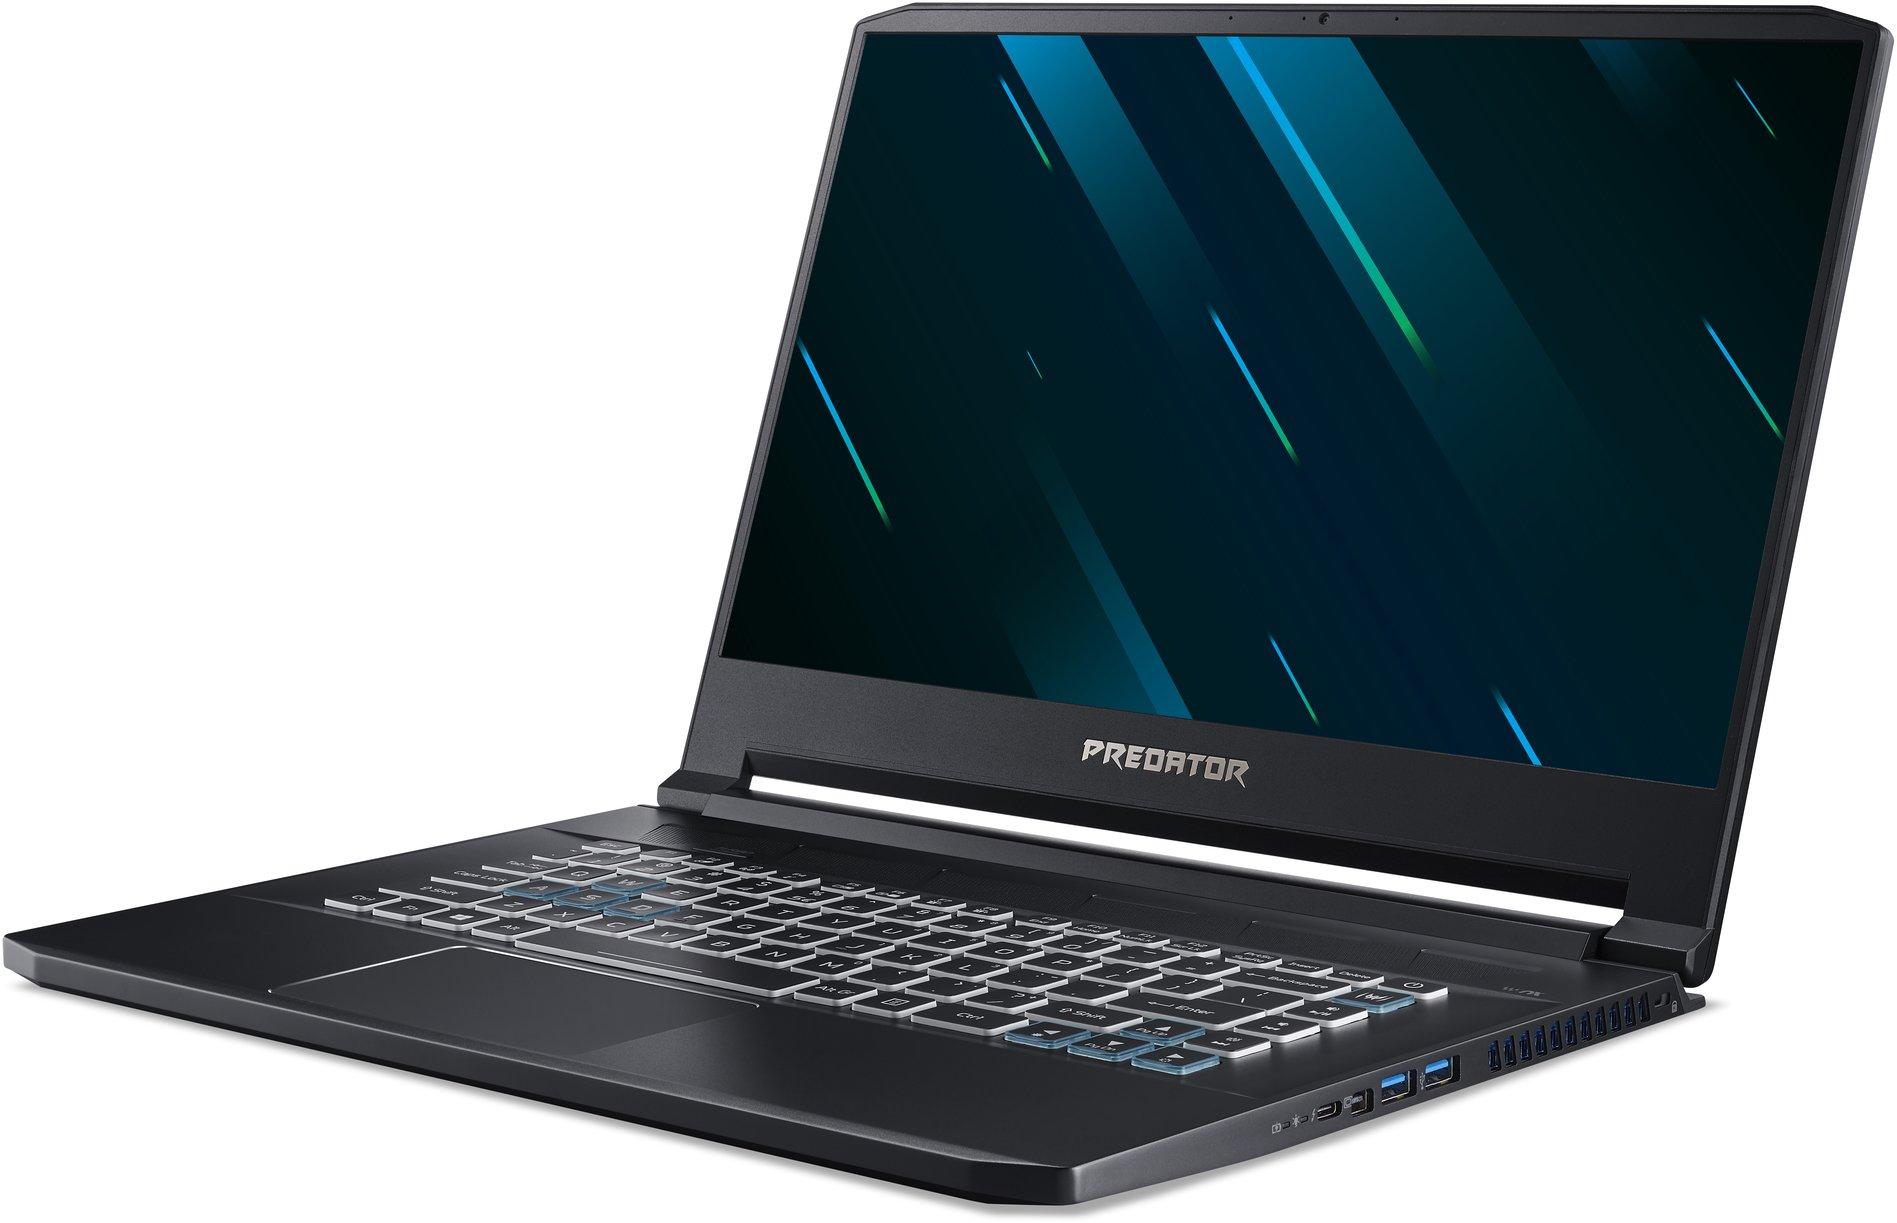 Acer Predator Triton 500 PT515-51-792R